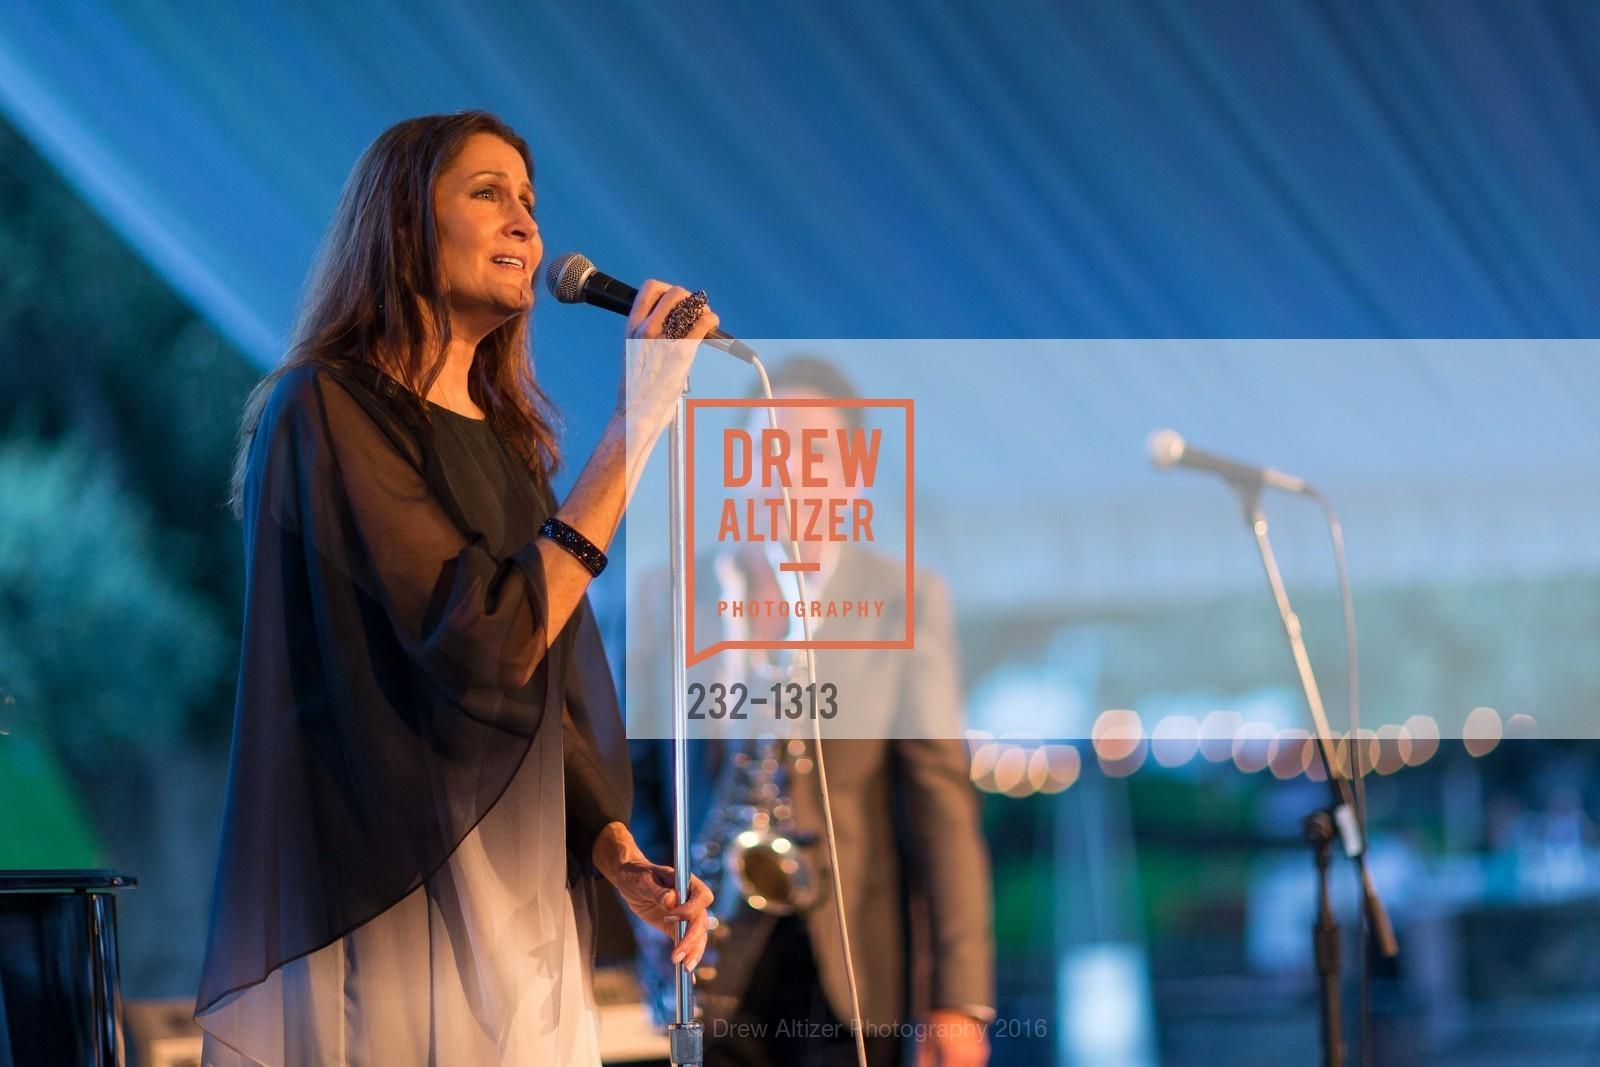 Monica Mancini, Photo #232-1313